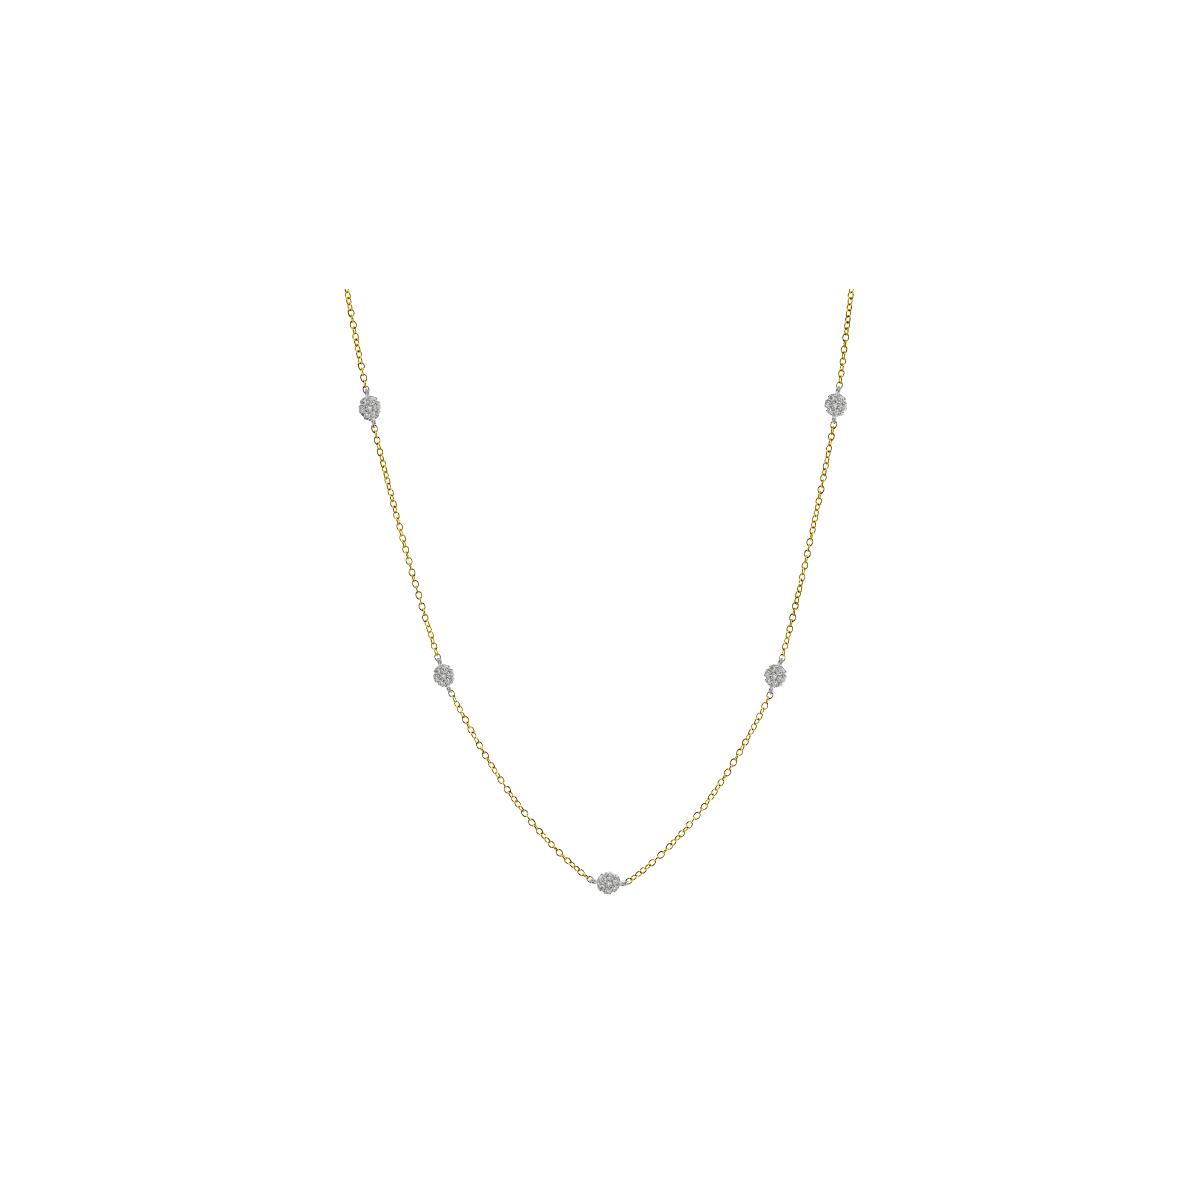 Simon G. Jewelry Necklace